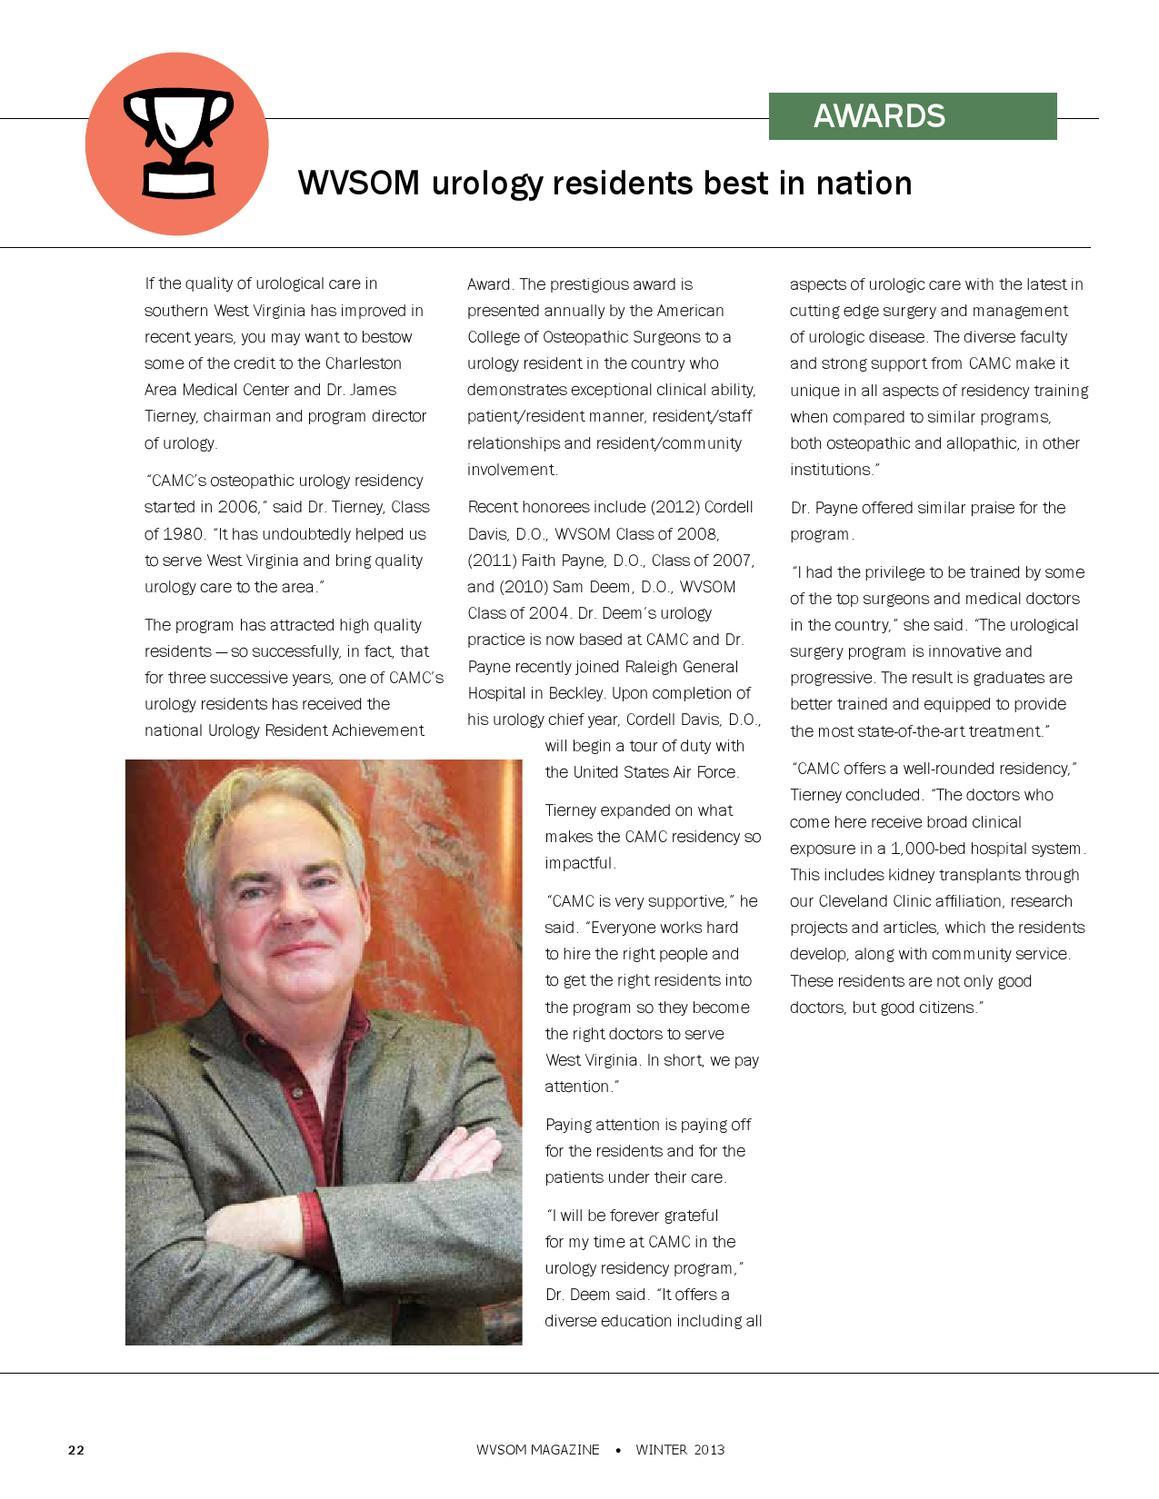 WVSOM Winter Magazine - 2013 by West Virginia School of Osteopathic